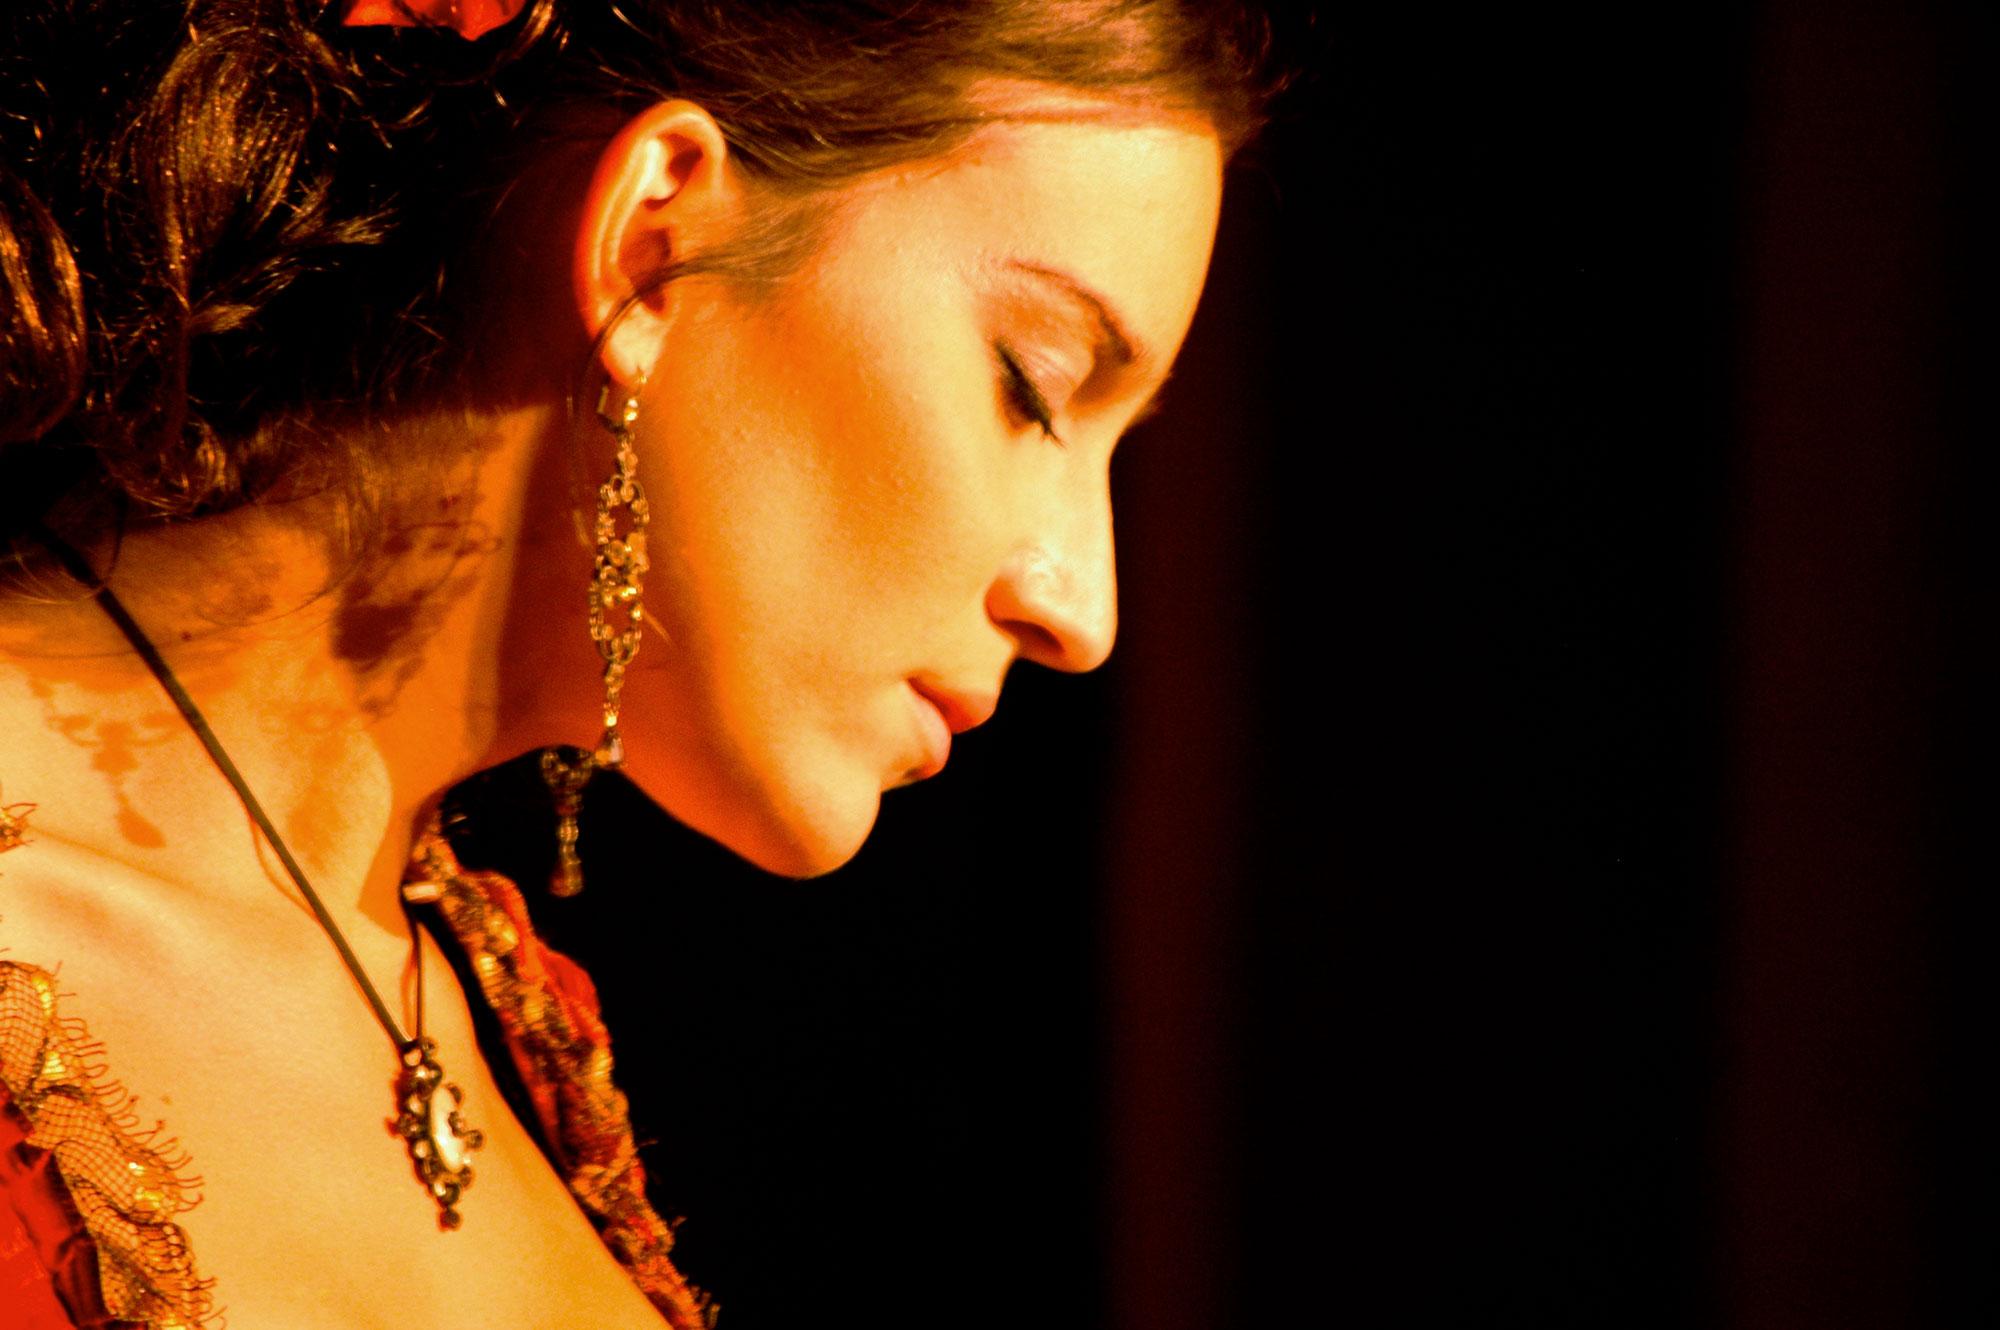 noces-comtesse-fabienne-conrad-02